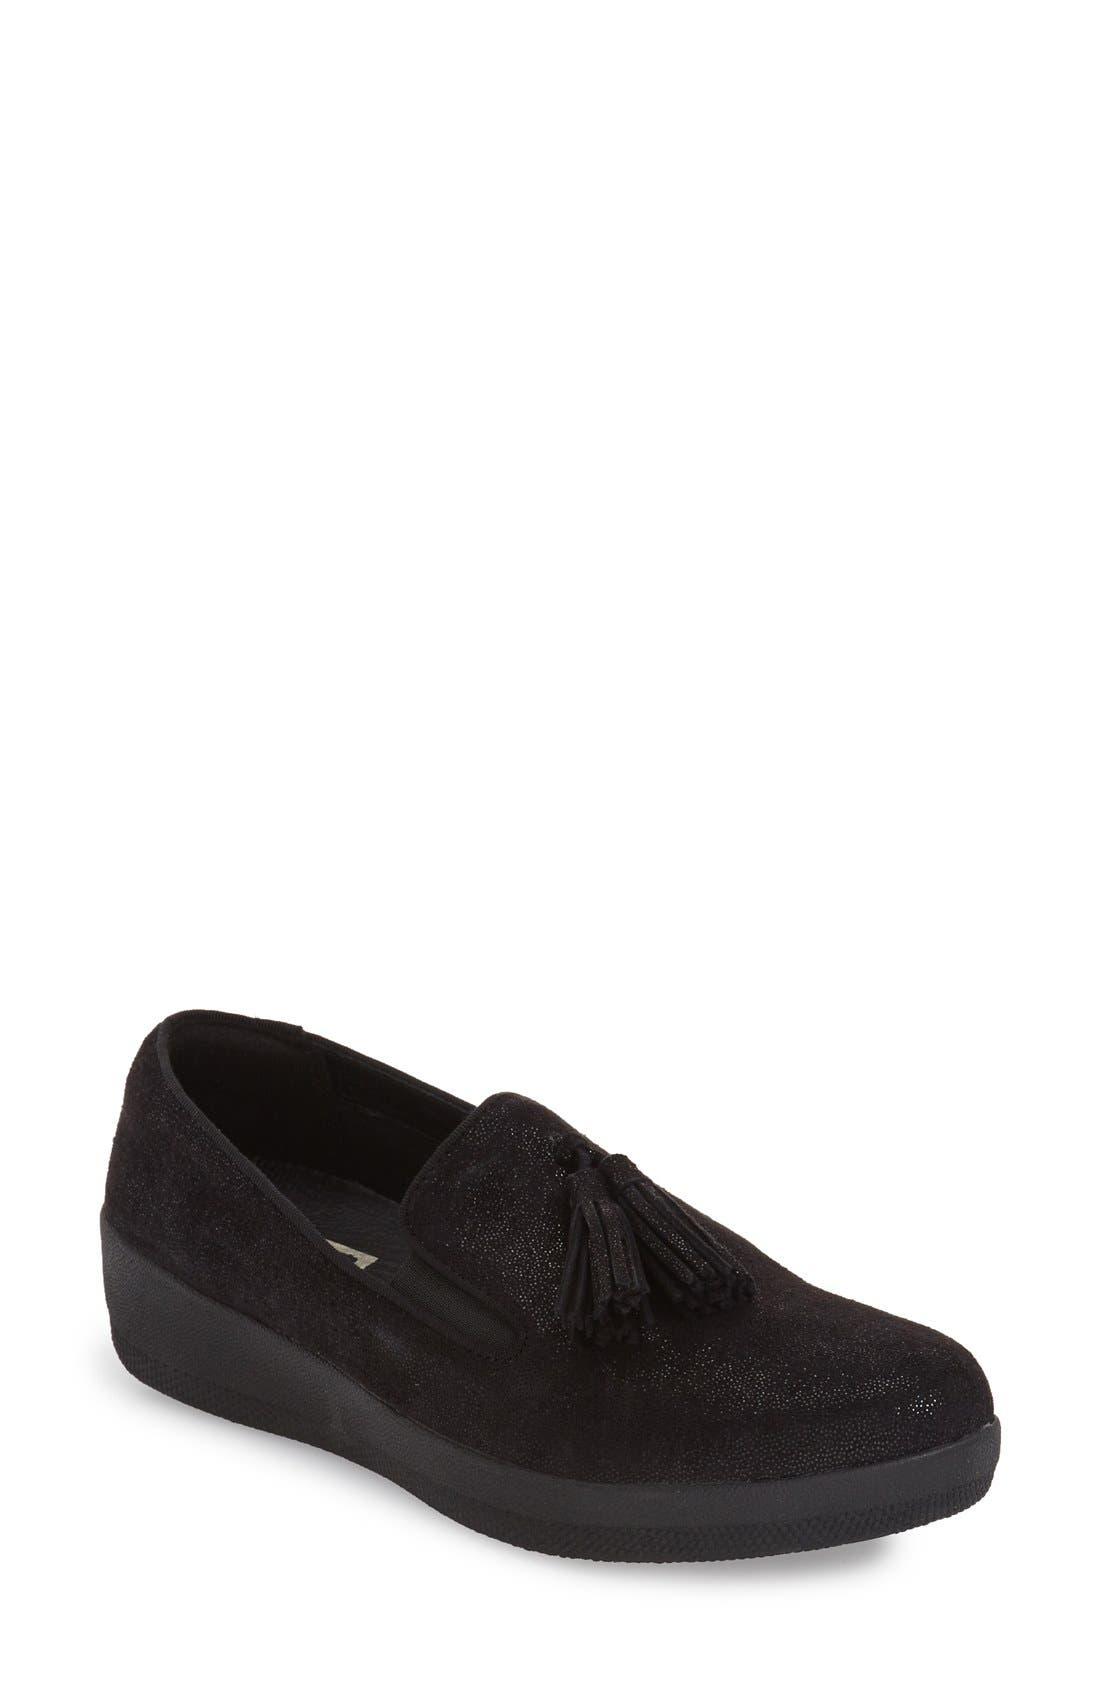 Tassle Superskate Wedge Sneaker,                             Main thumbnail 2, color,